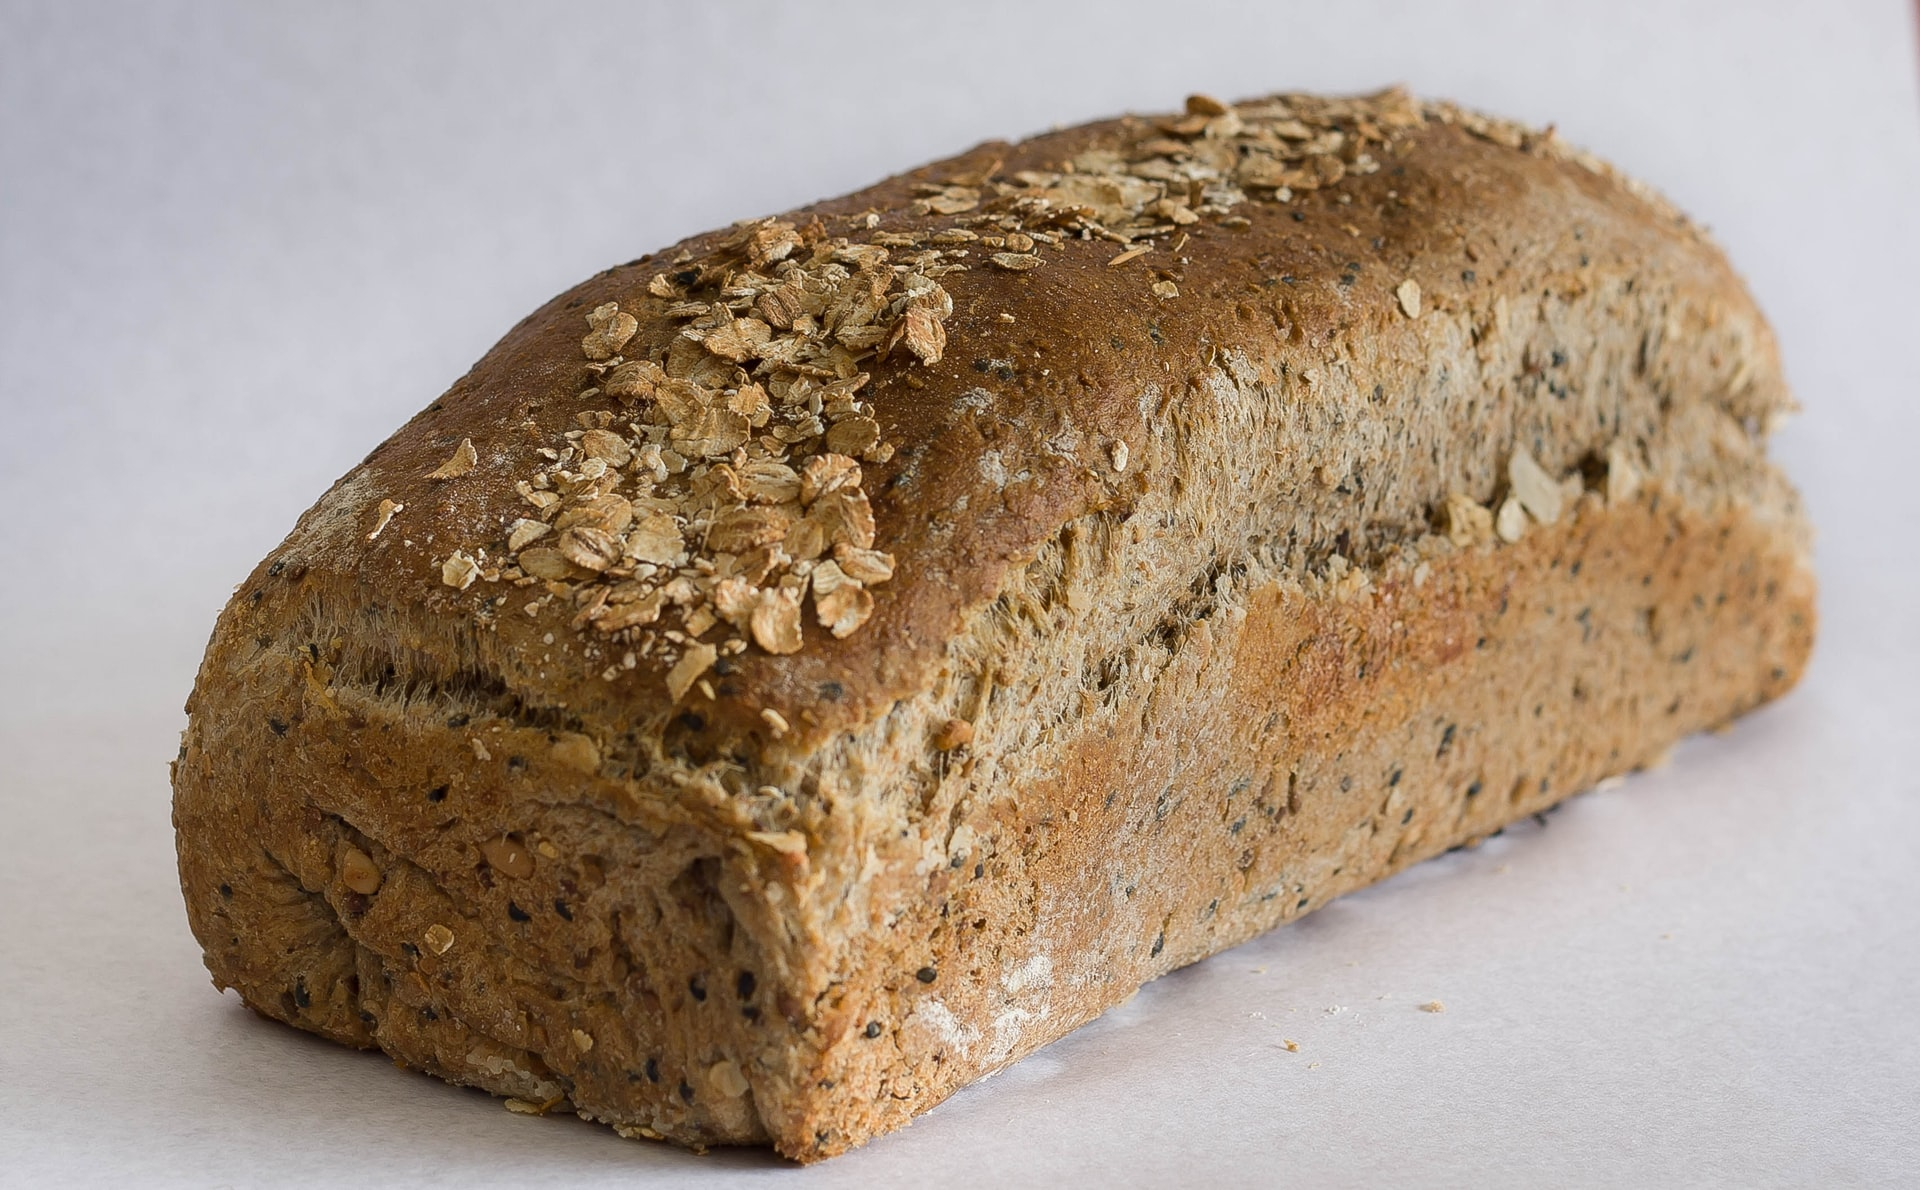 sergio-arze-8JGA8LZv9i4-unsplash bread